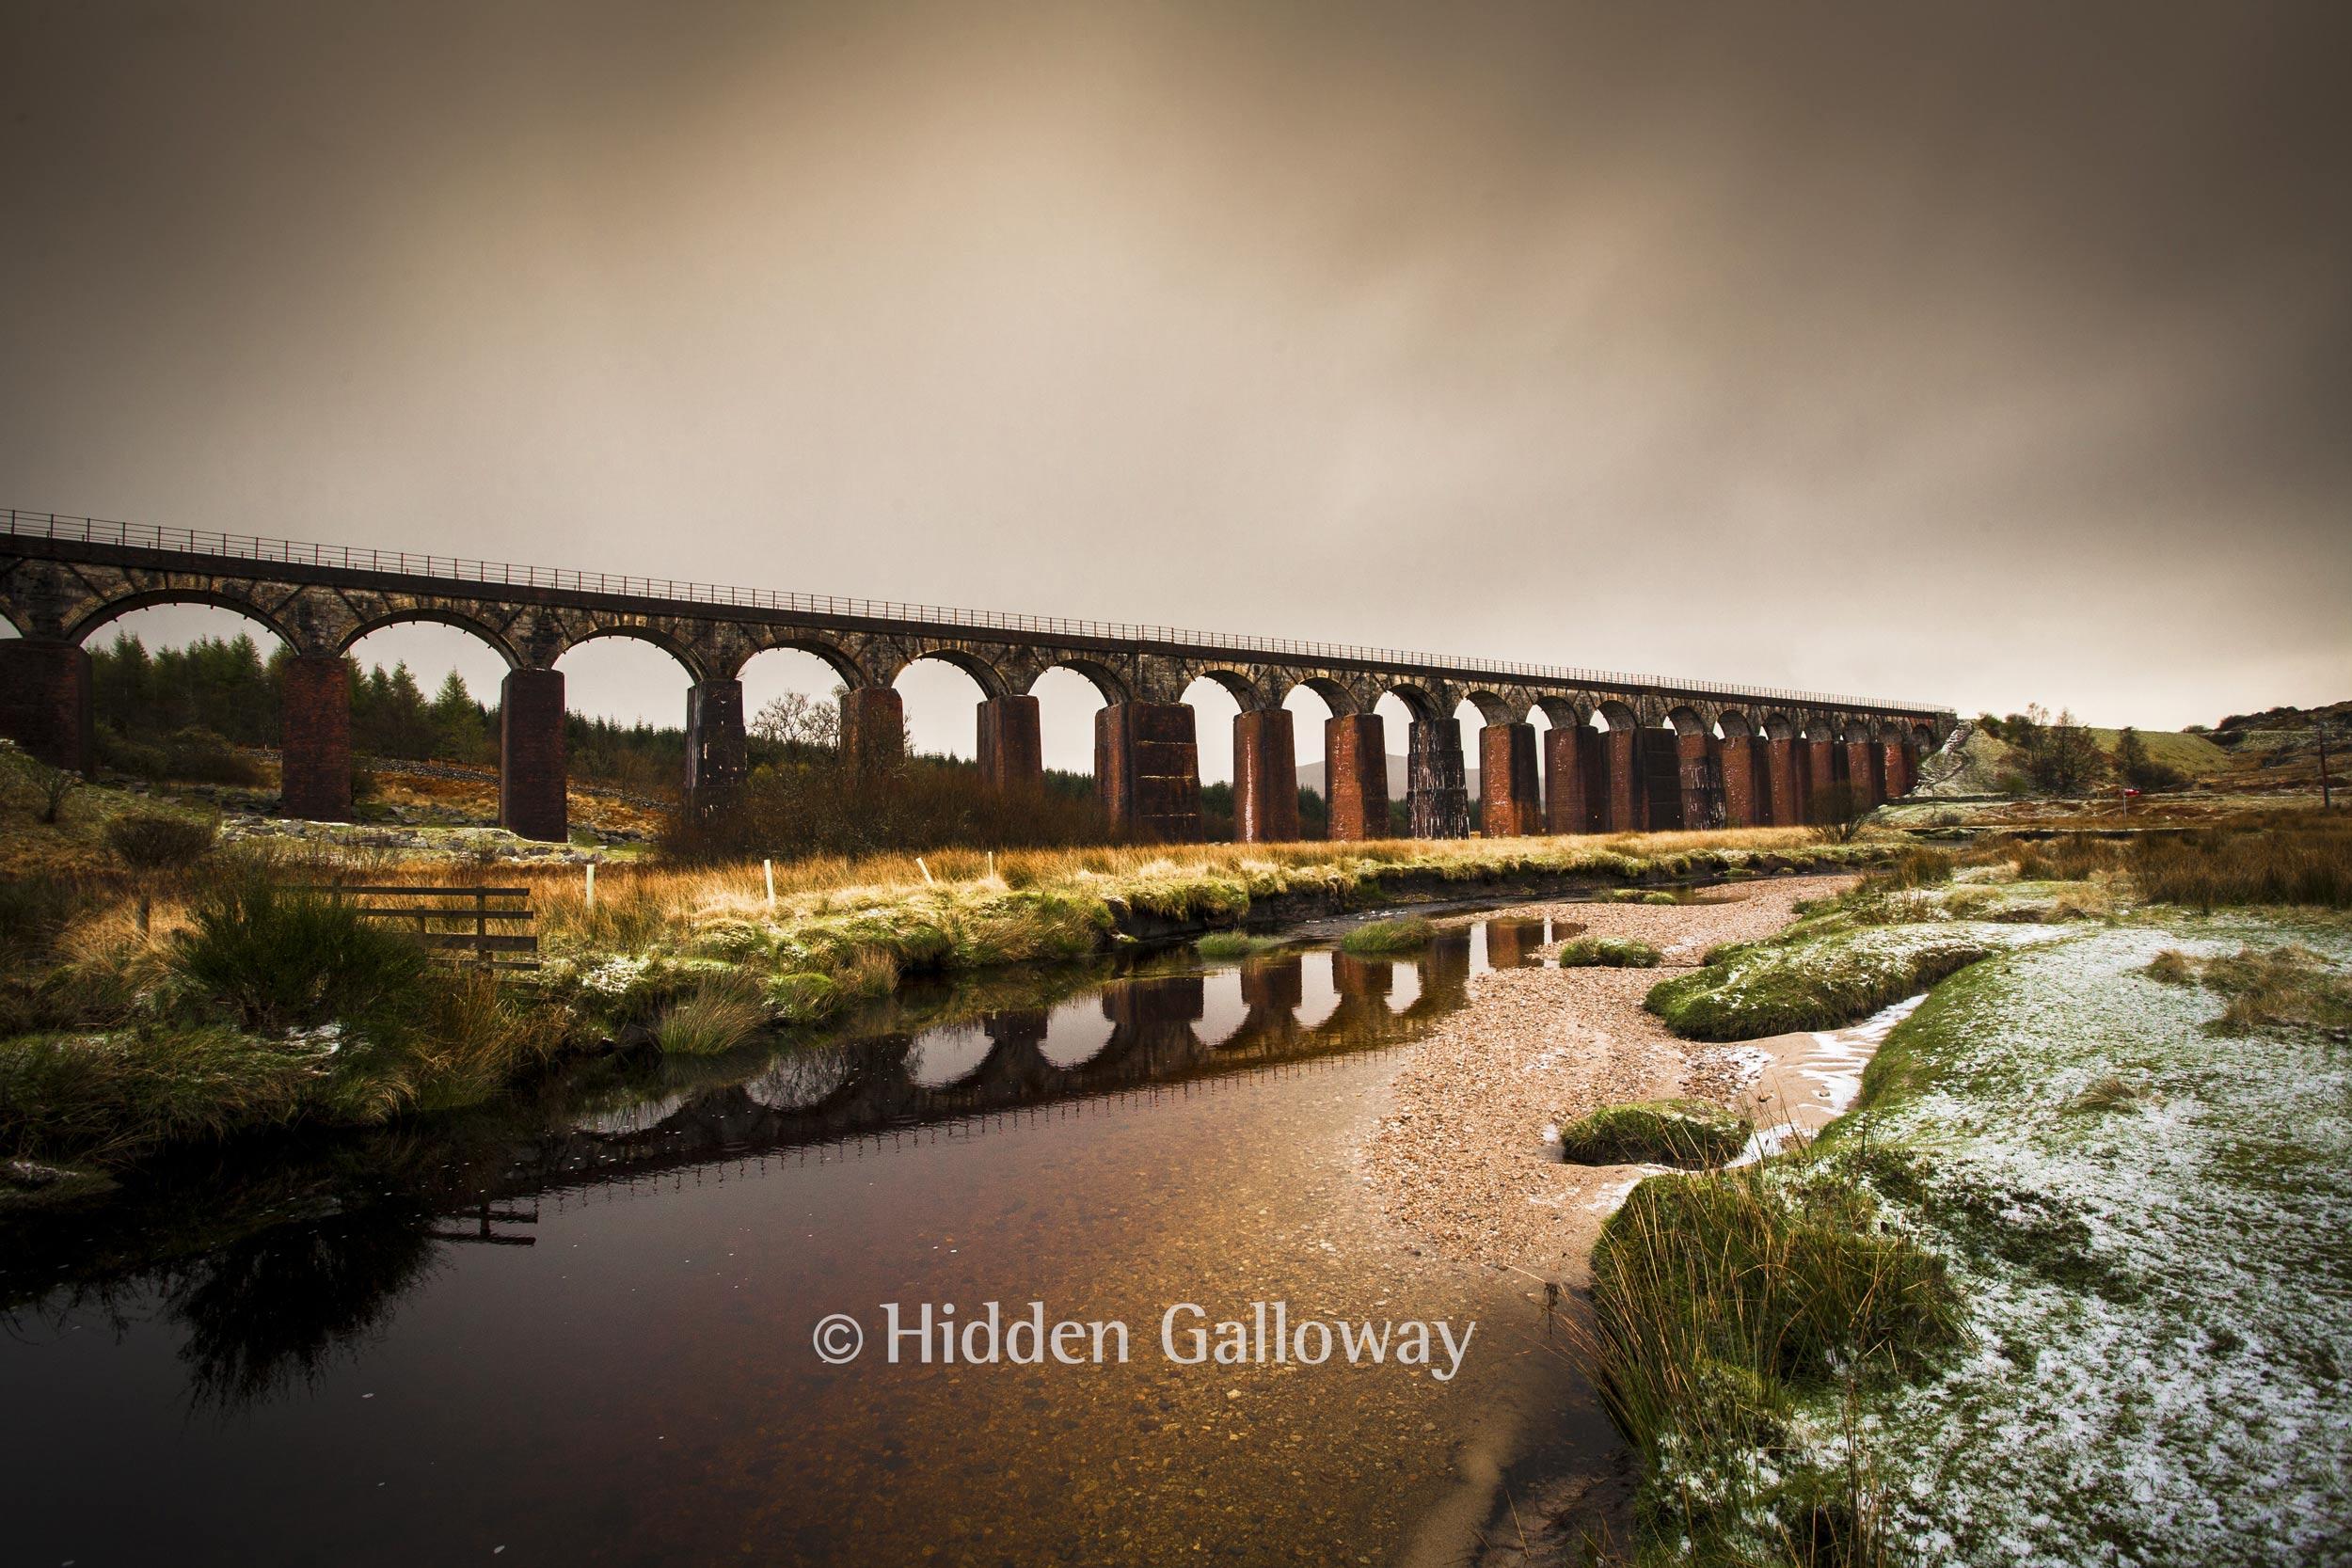 galloway-31.jpg